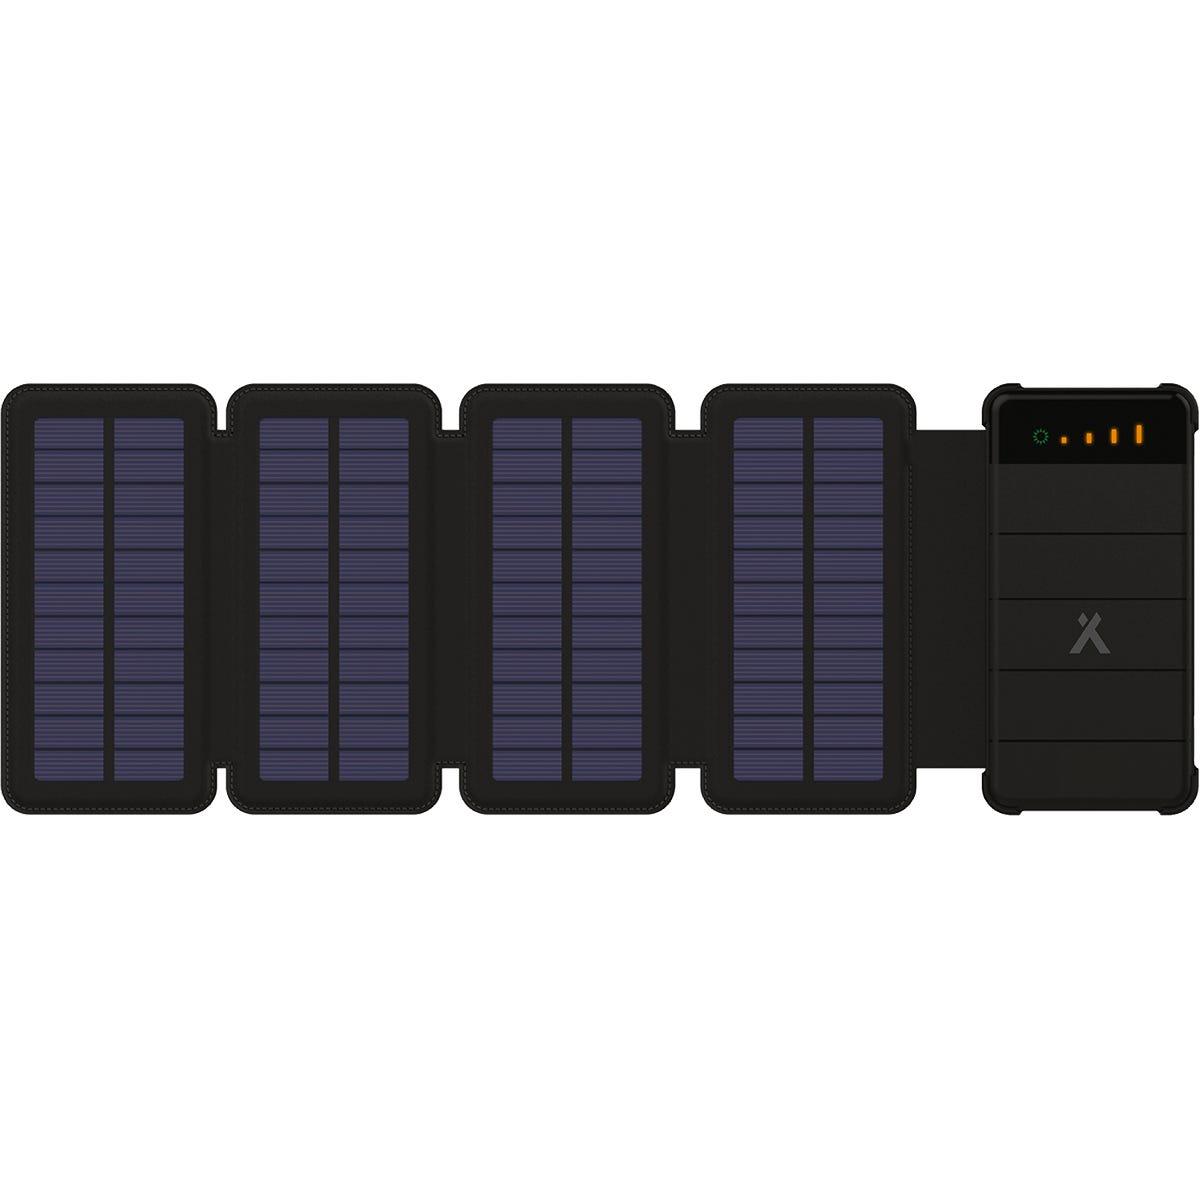 Image of Bear Grylls 8000mAh Solar Power Bank